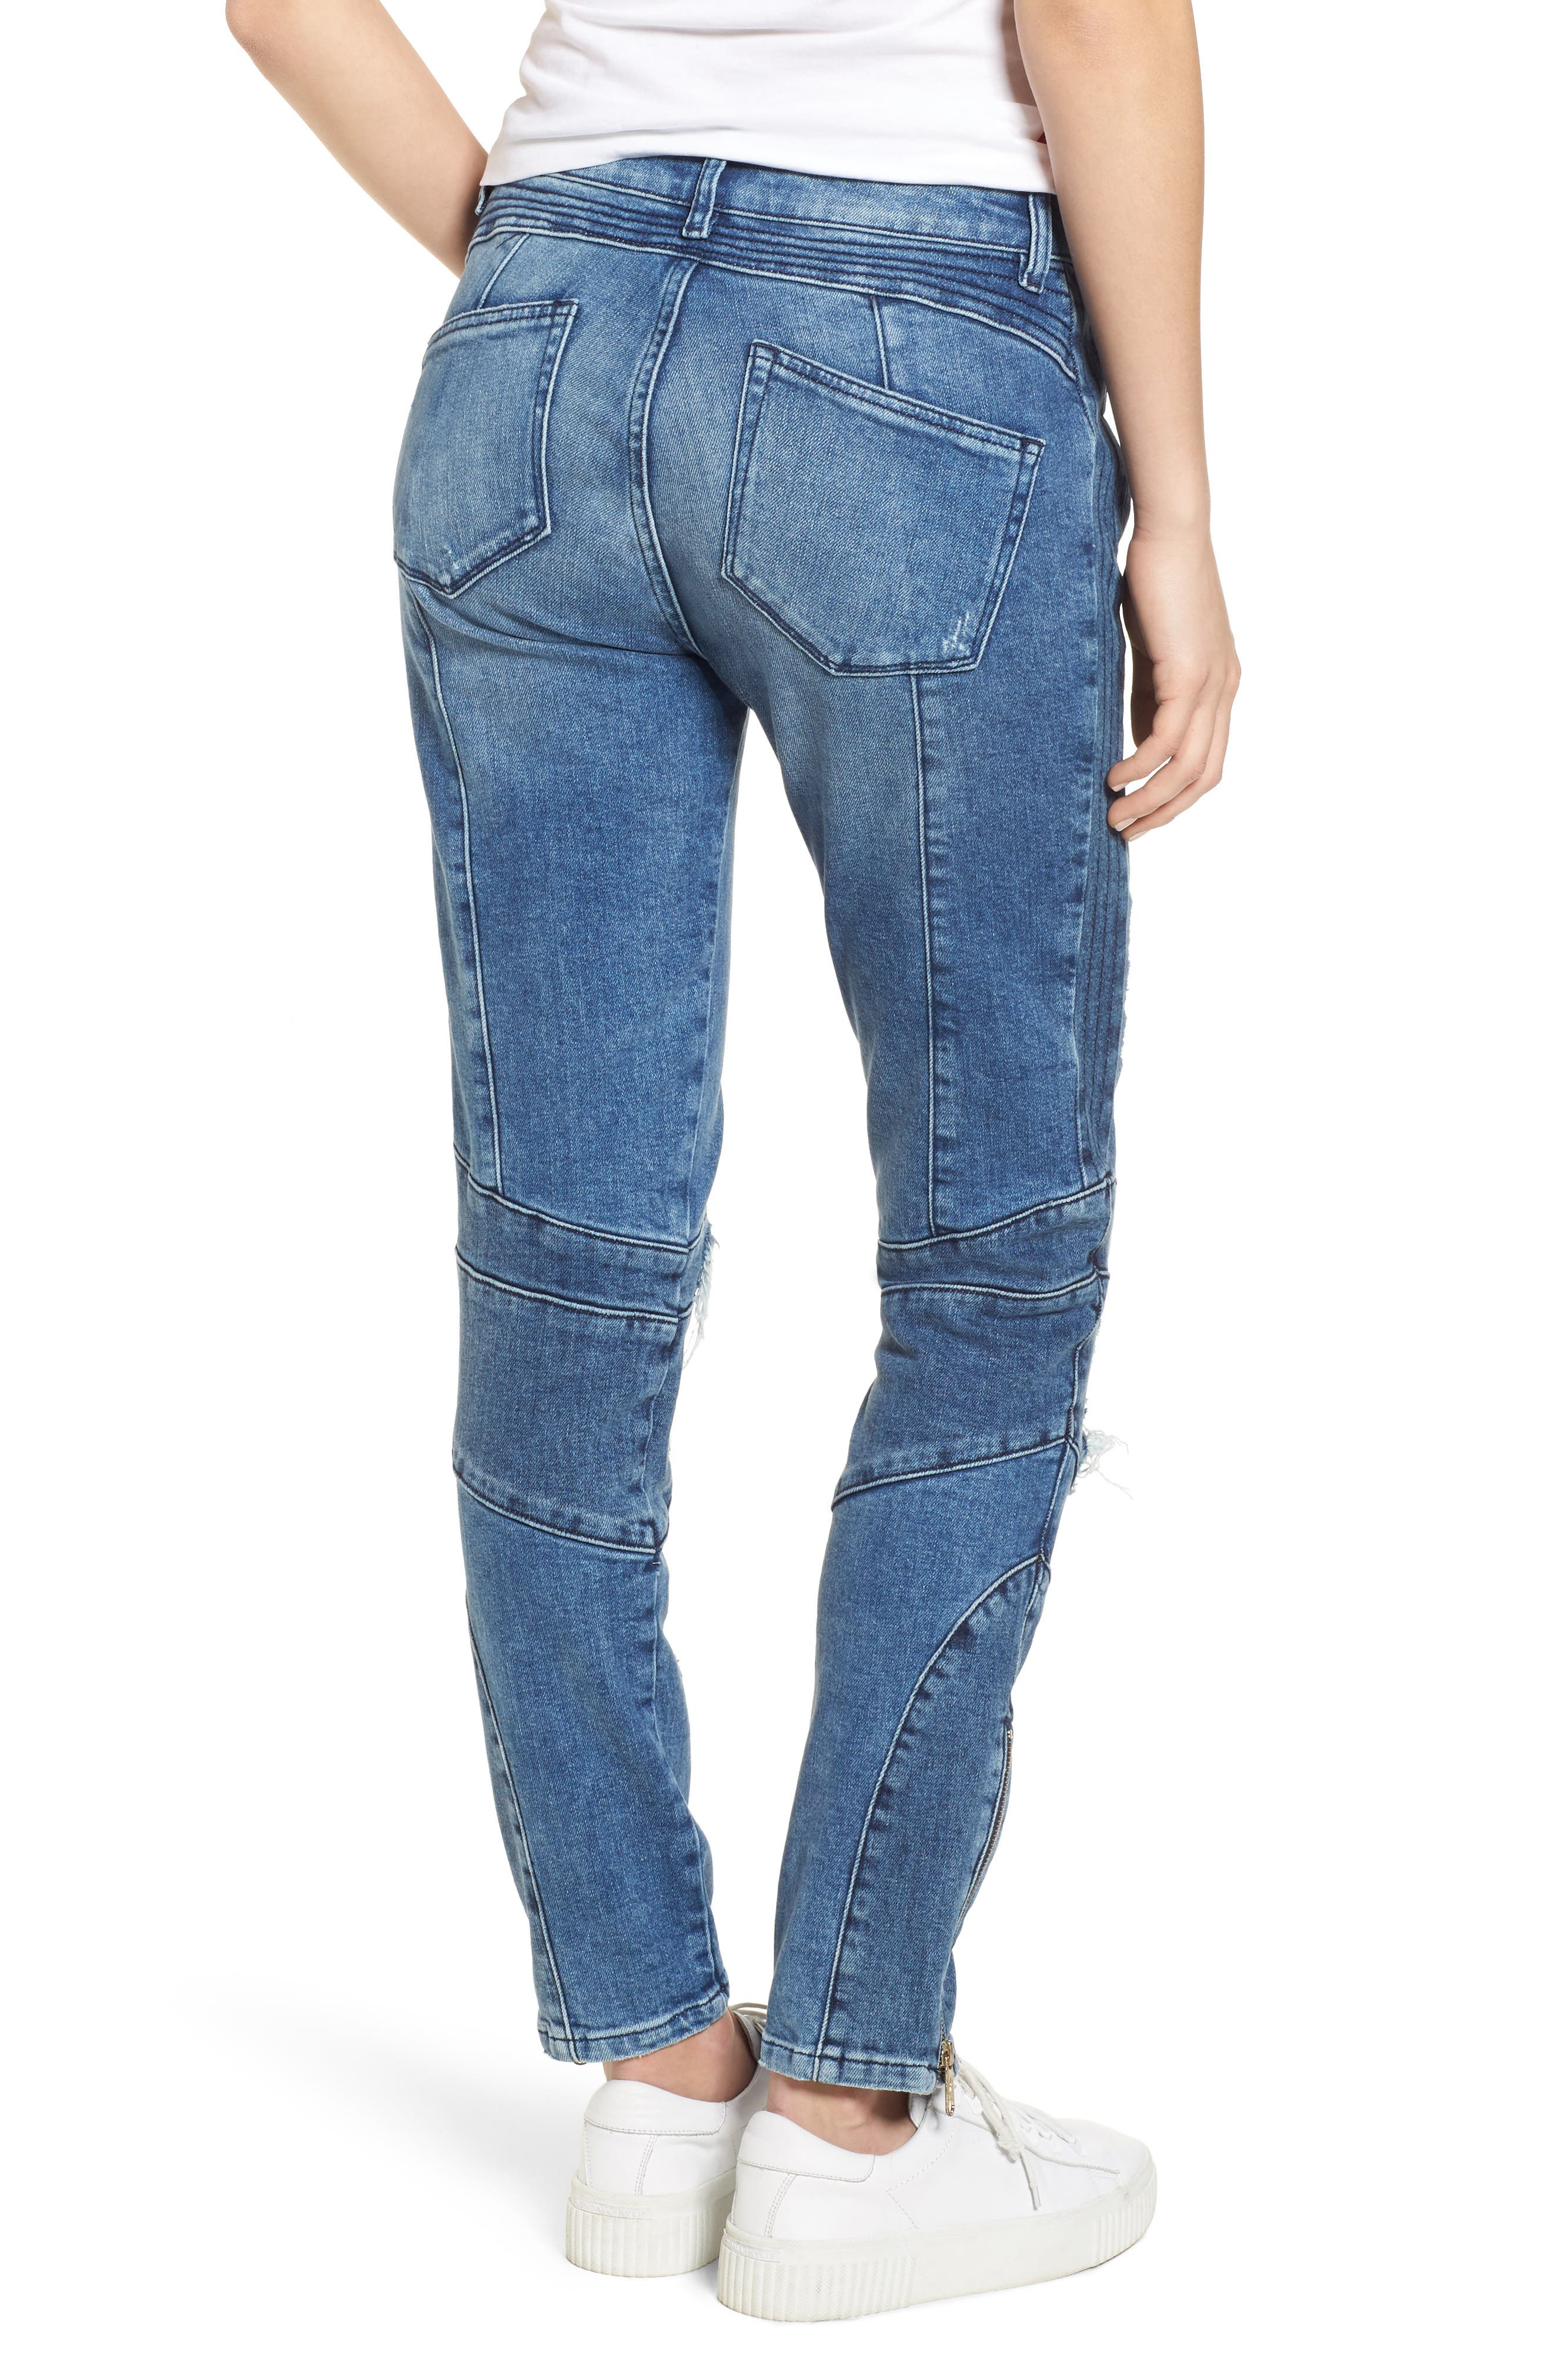 x Gigi Hadid Speed Distressed Ankle Zip Jeans,                             Alternate thumbnail 2, color,